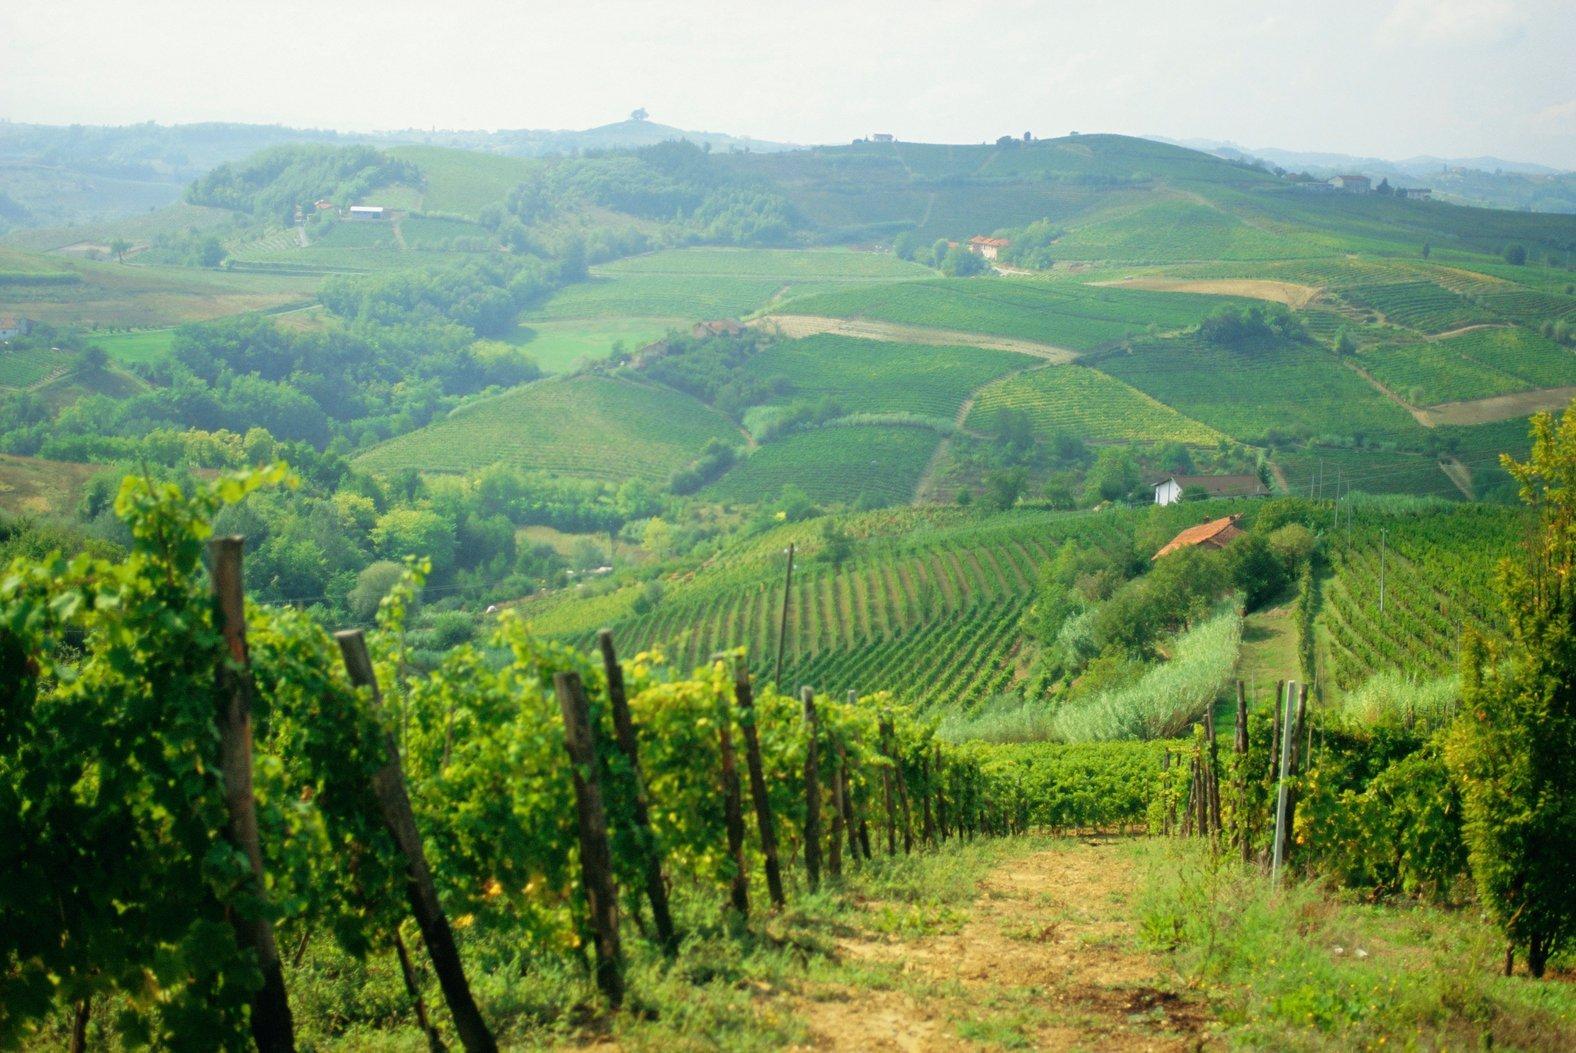 ARBYWT Typical landscape of vines in the Colli Piacentini, Piacenza, Emilia Romagna, Italy, Europe